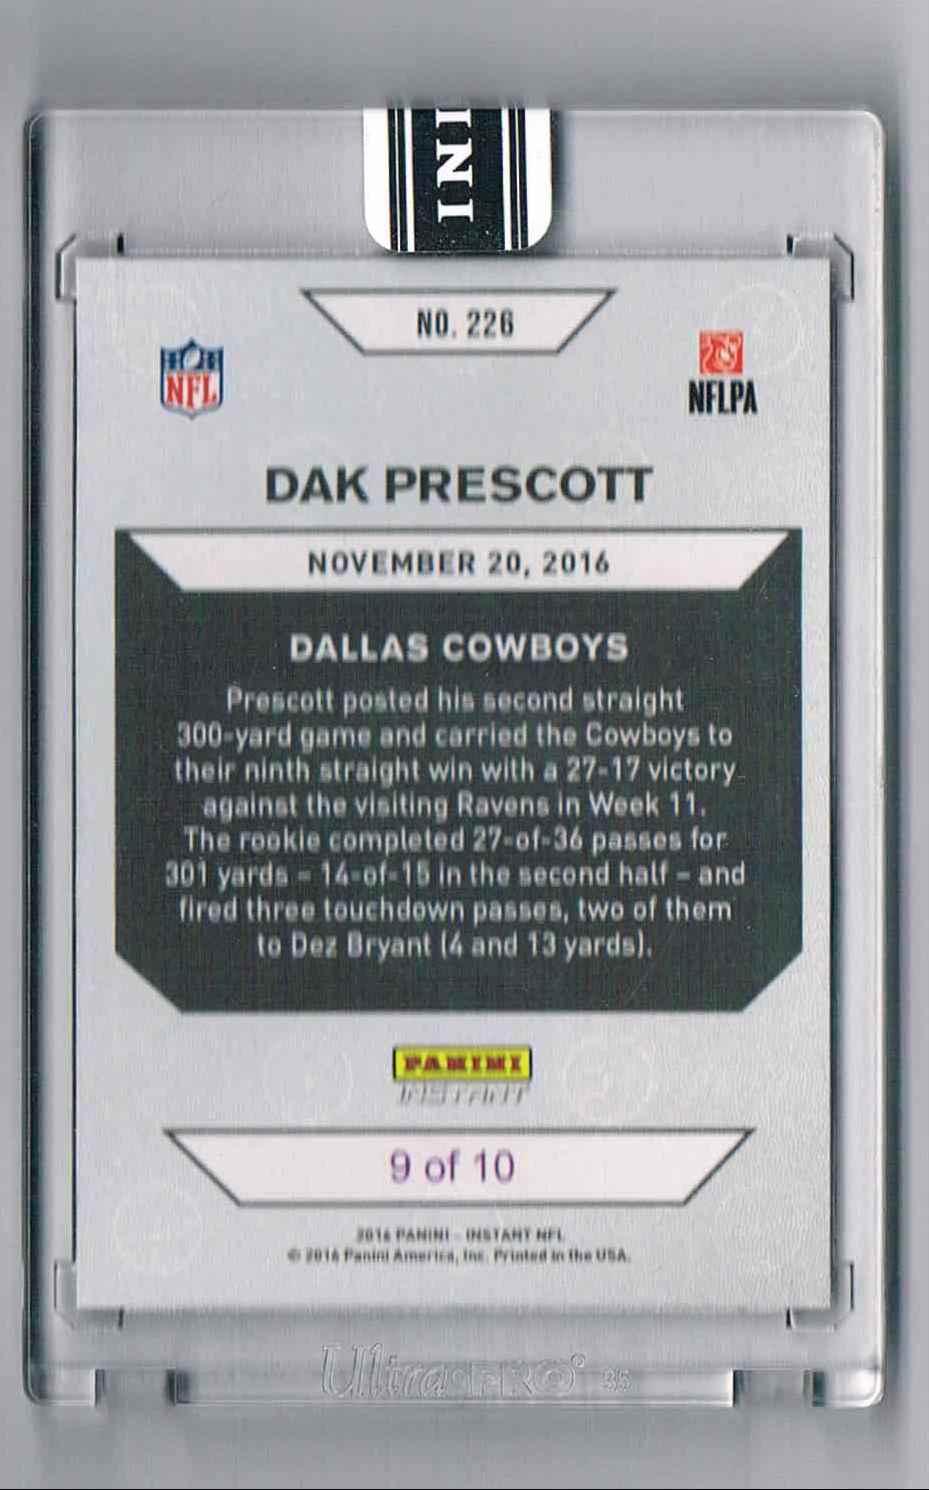 2016 Panini Instant-11-20-16 Dak Prescott card back image